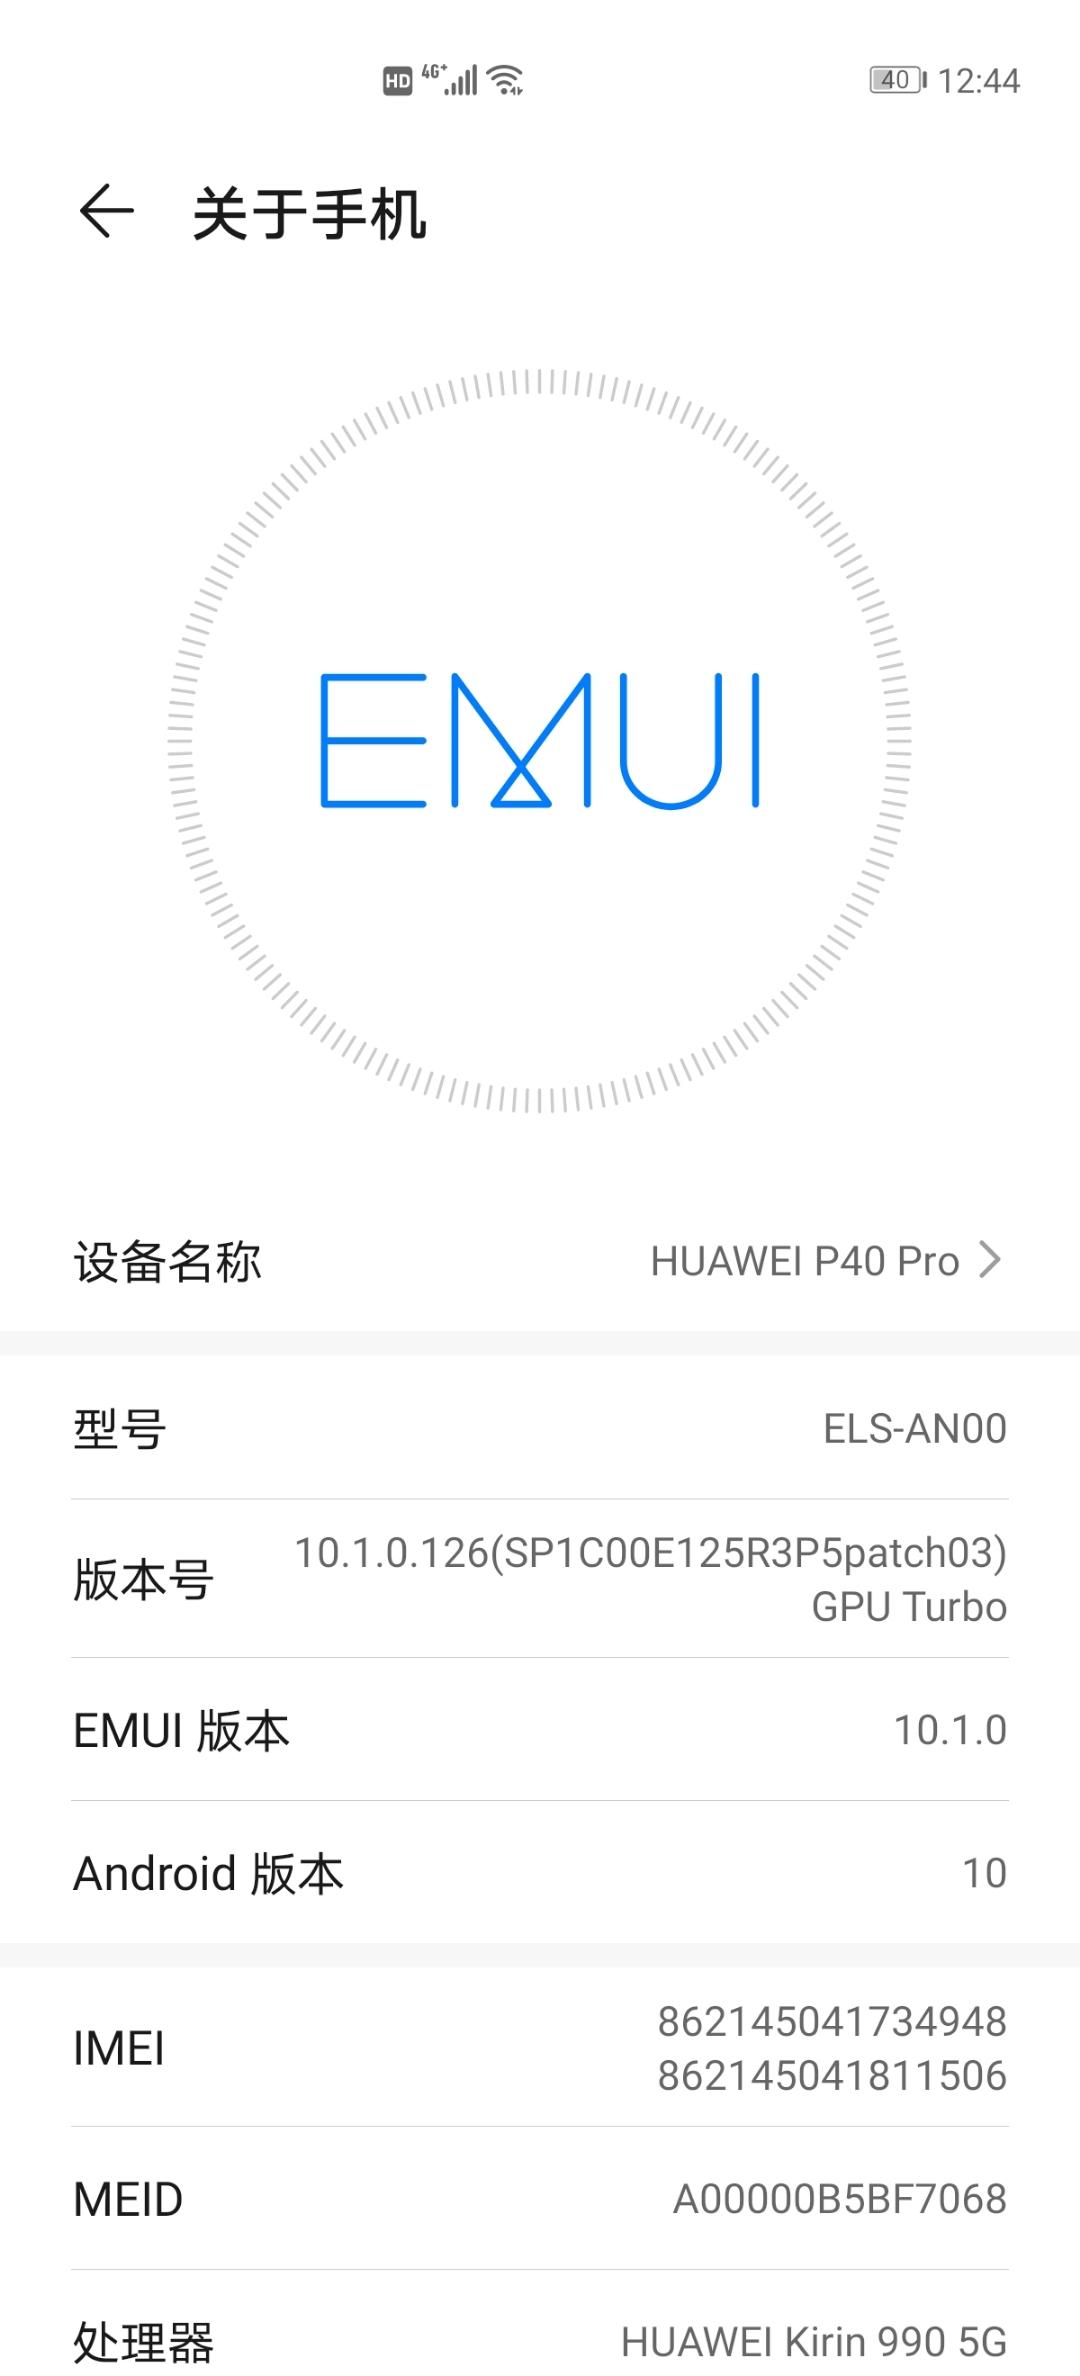 Screenshot_20200507_124500_com.android.settings.jpg